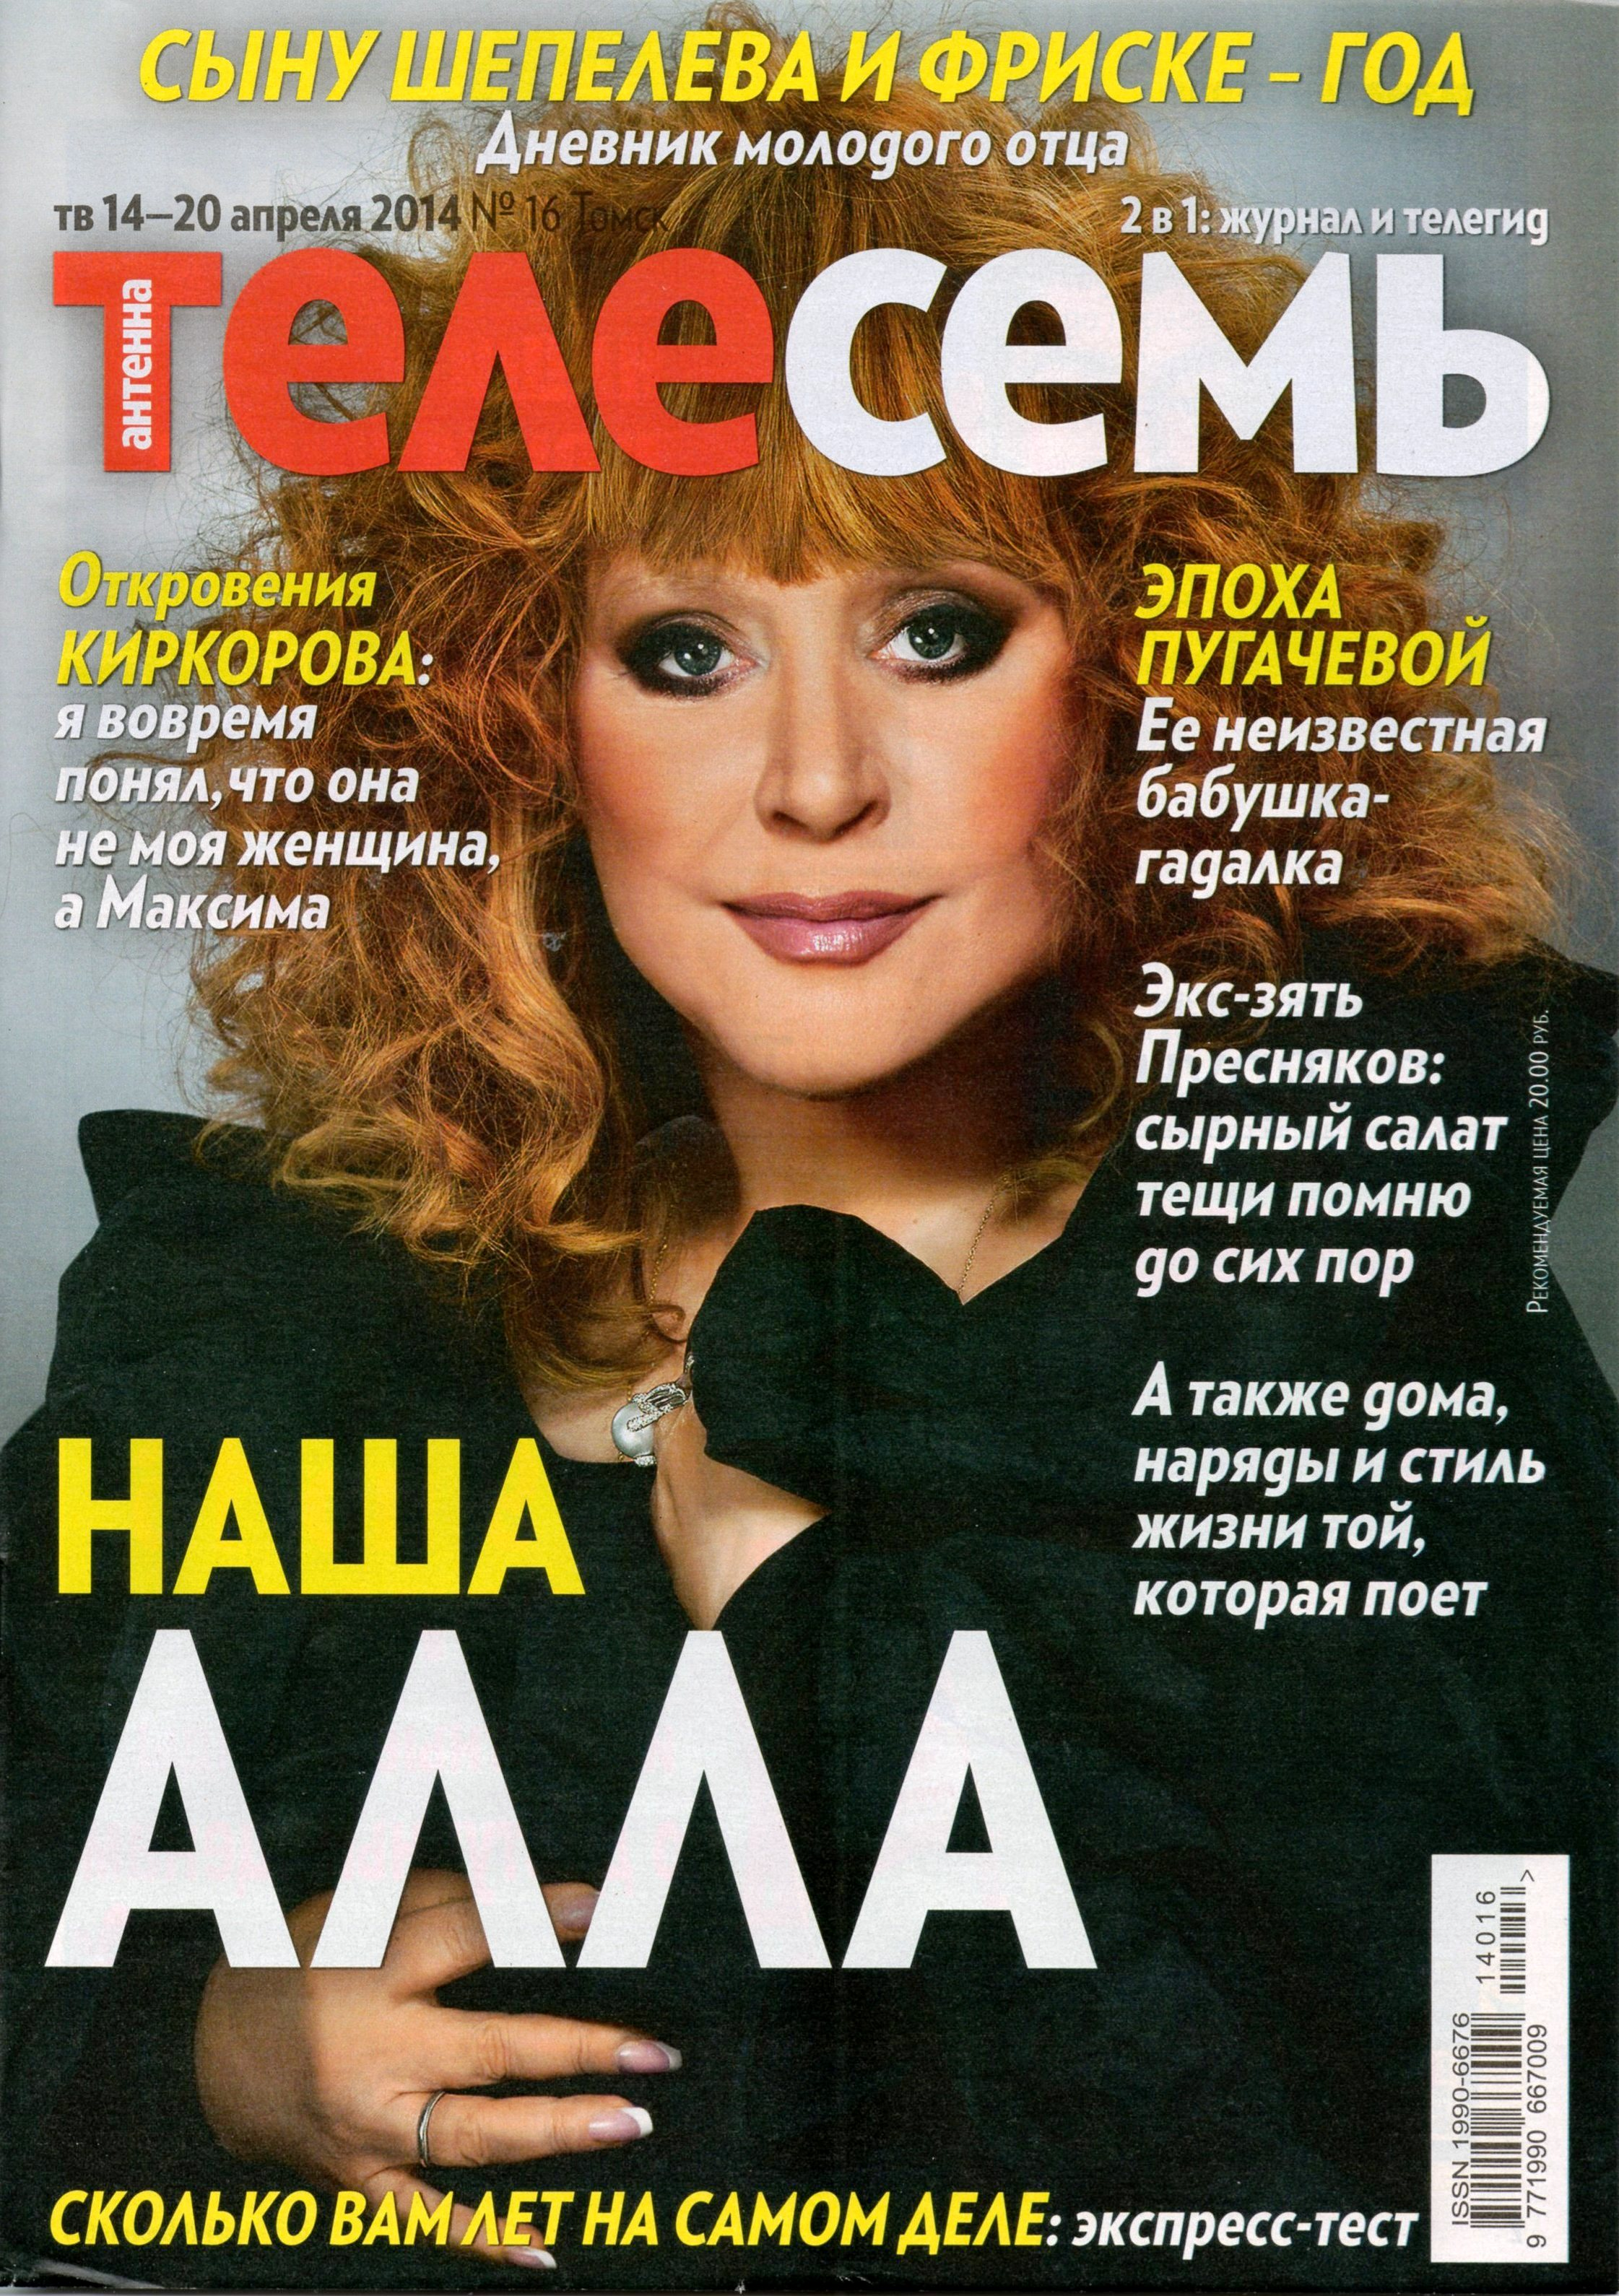 http://se.uploads.ru/kC3Gr.jpg